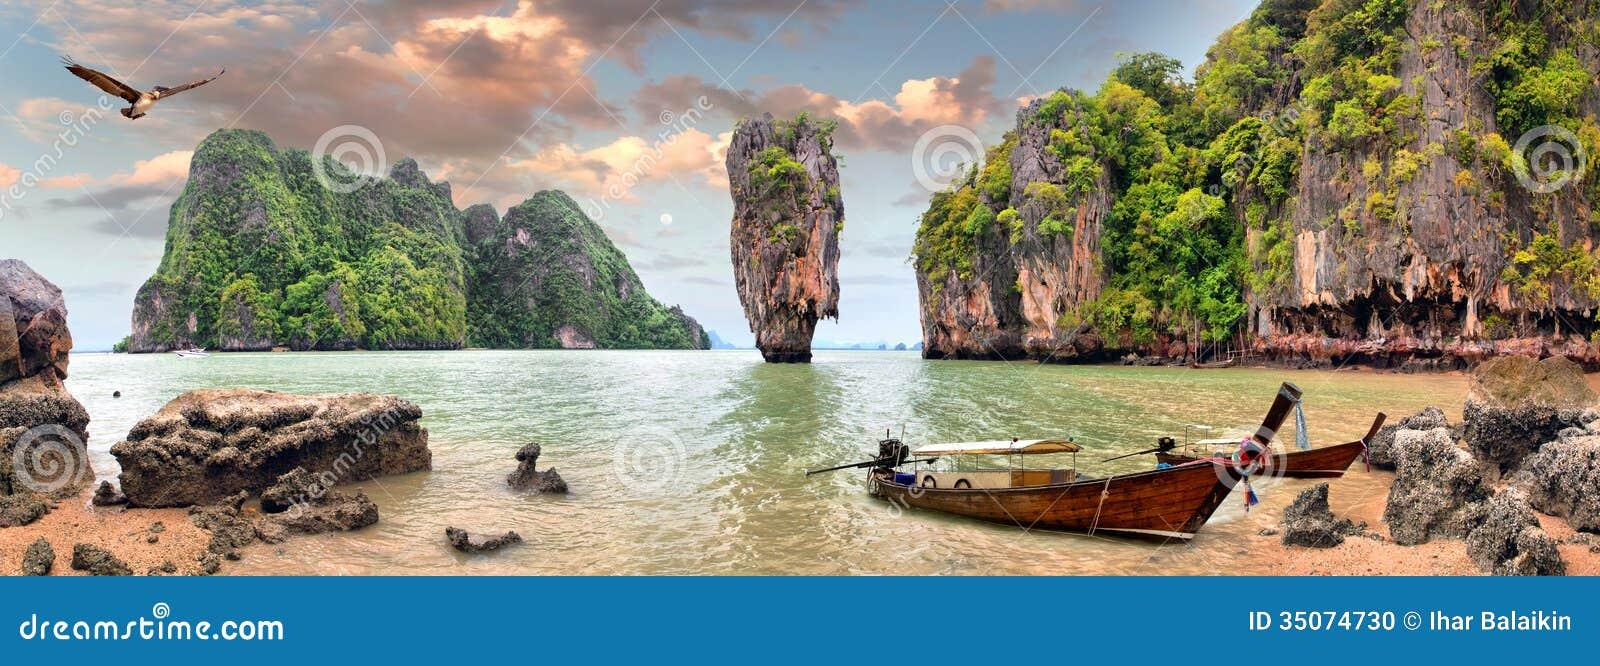 Download James Bond Island stock photo. Image of remote, finger - 35074730